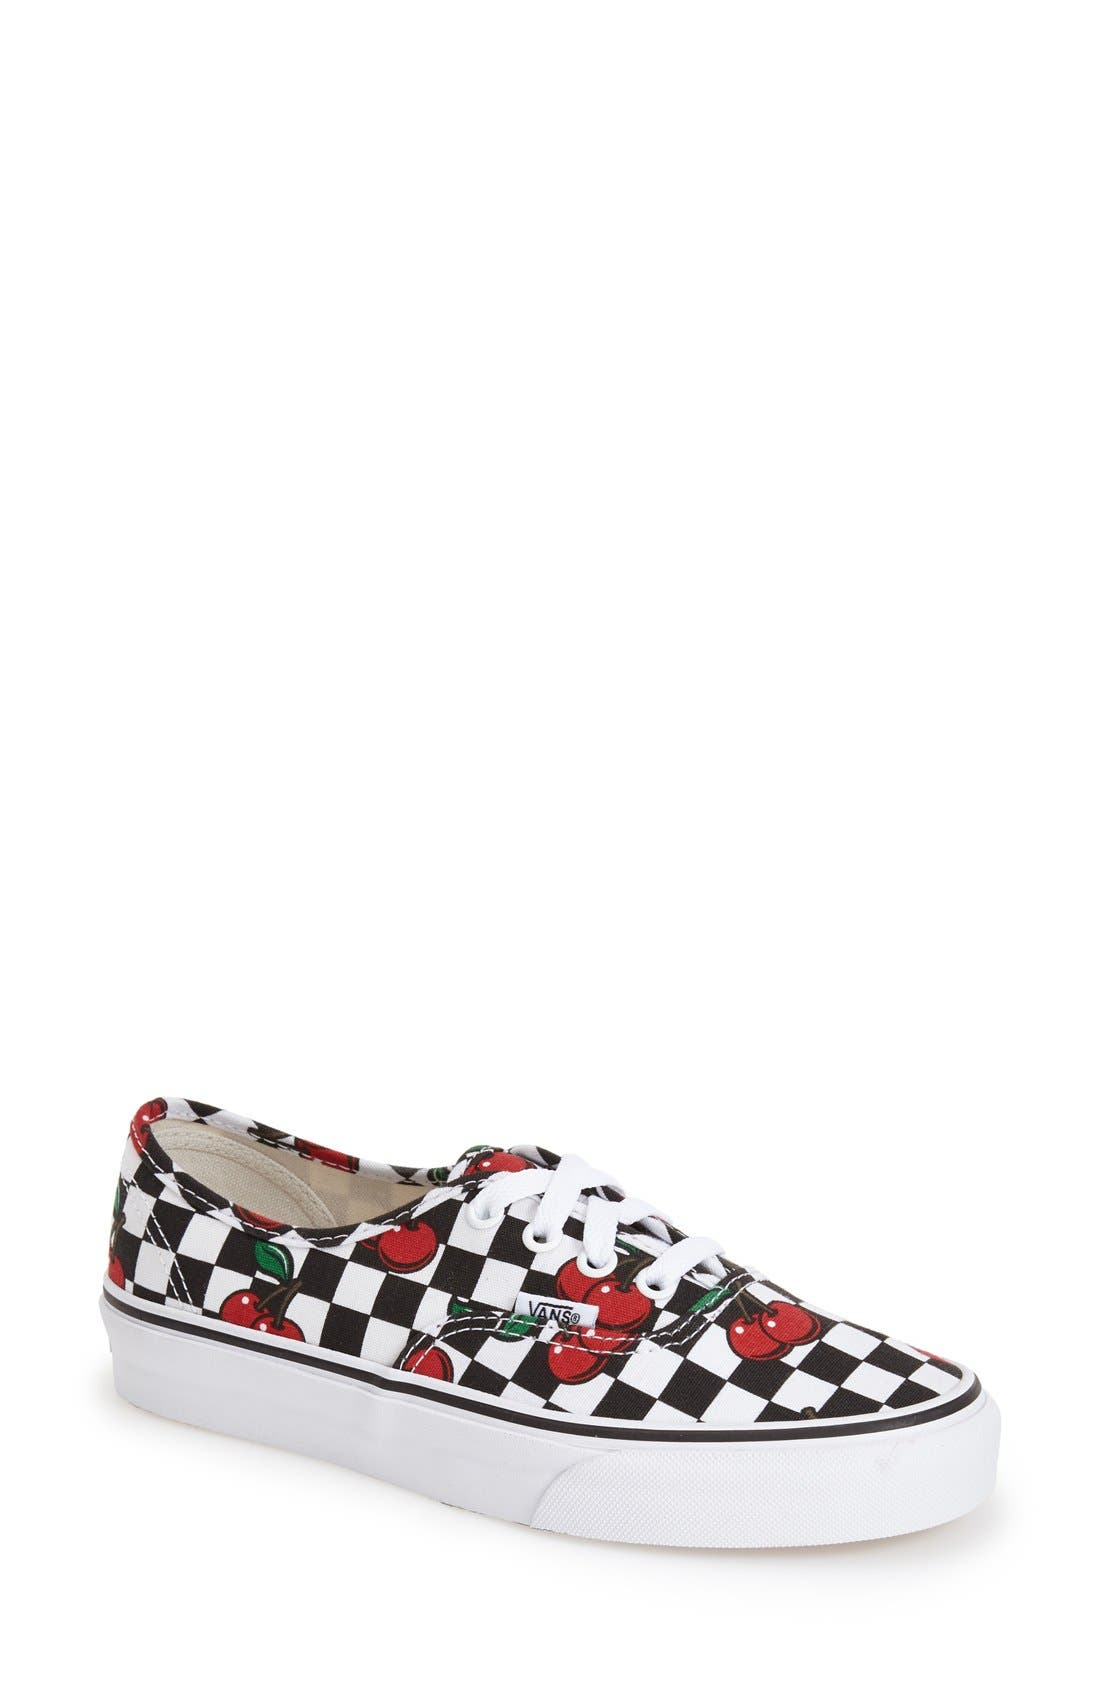 Alternate Image 1 Selected - Vans 'Authentic - Cherry' Sneaker (Women)